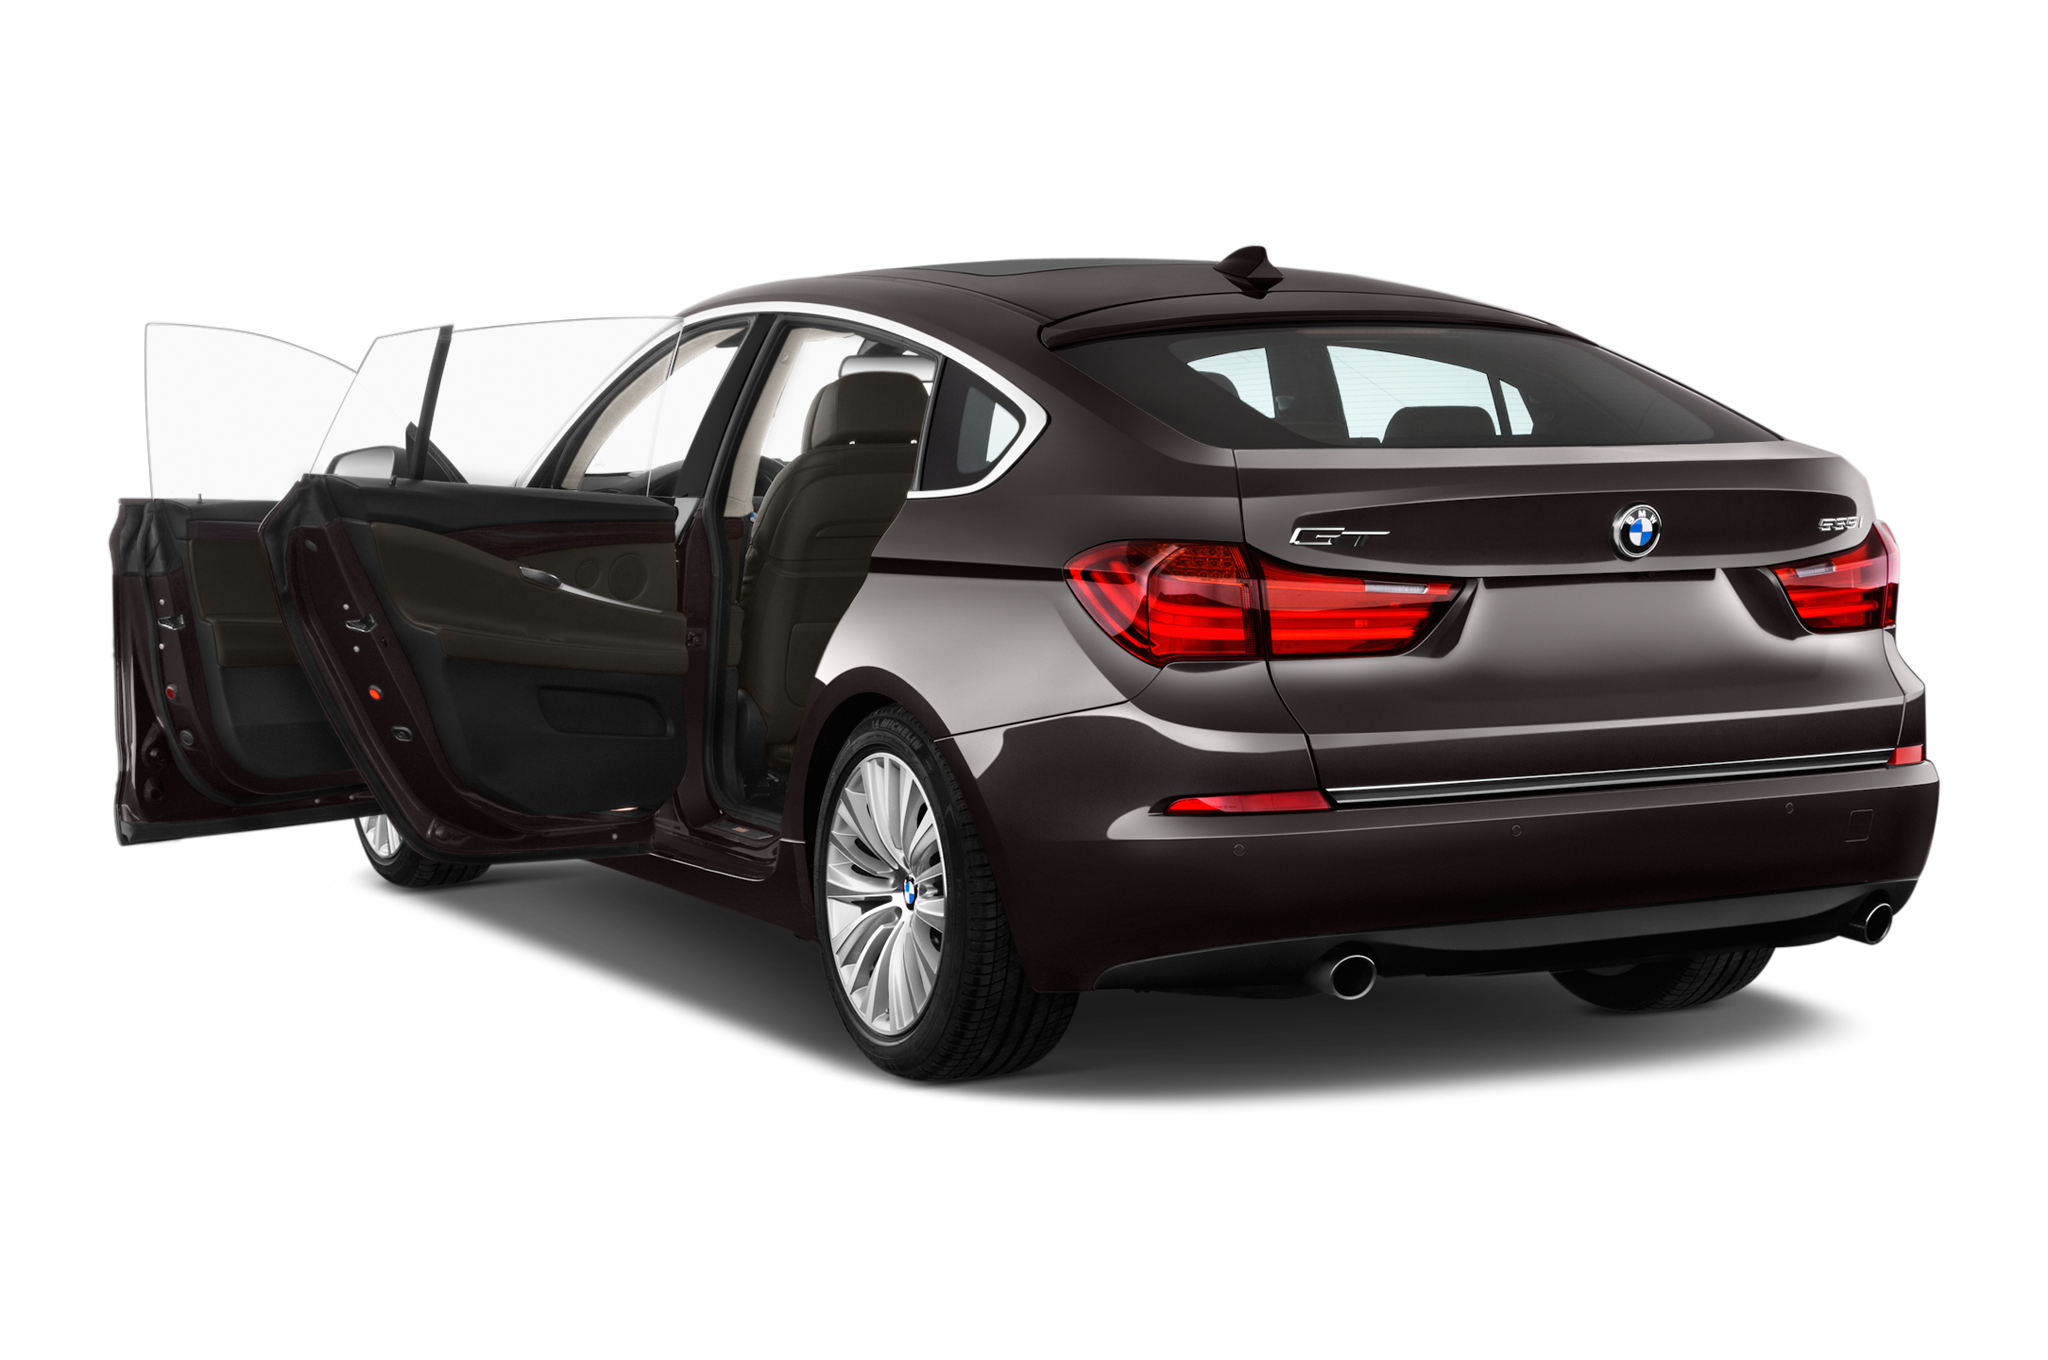 2017 bmw 5 series sedan spied with sleeker shape. Black Bedroom Furniture Sets. Home Design Ideas